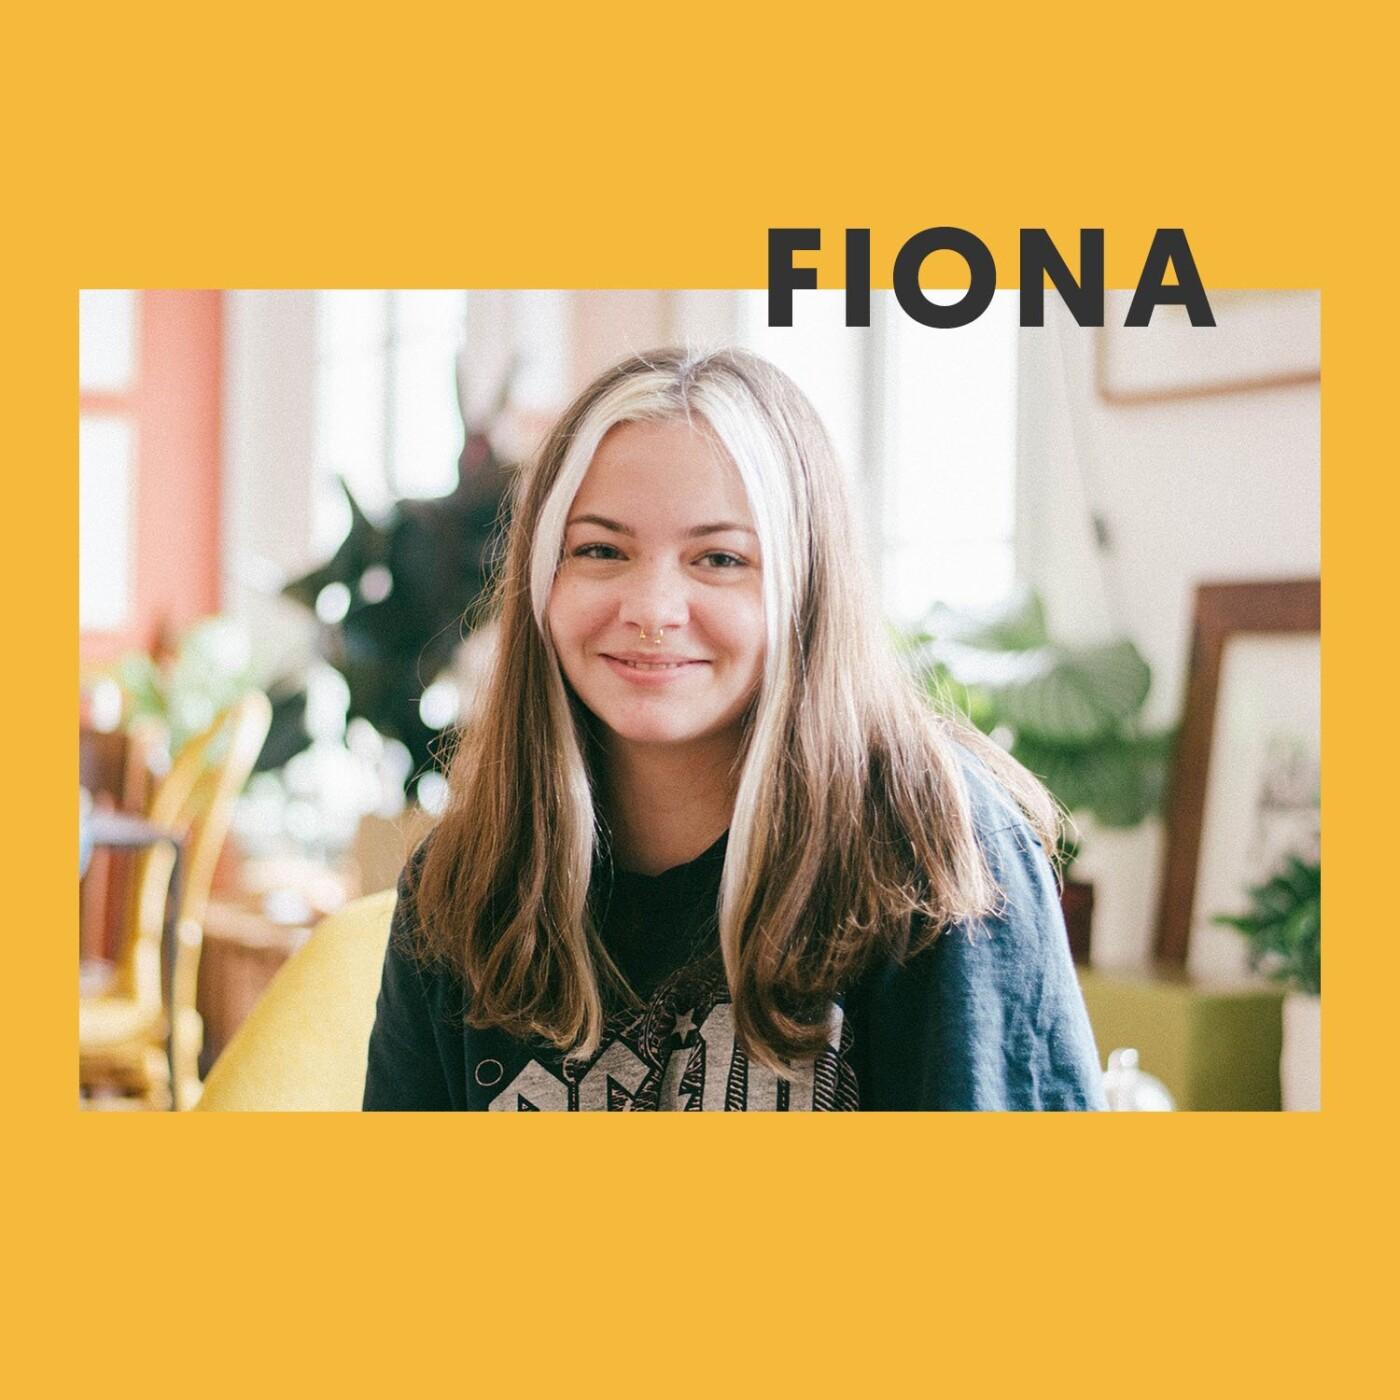 41 • Fiona